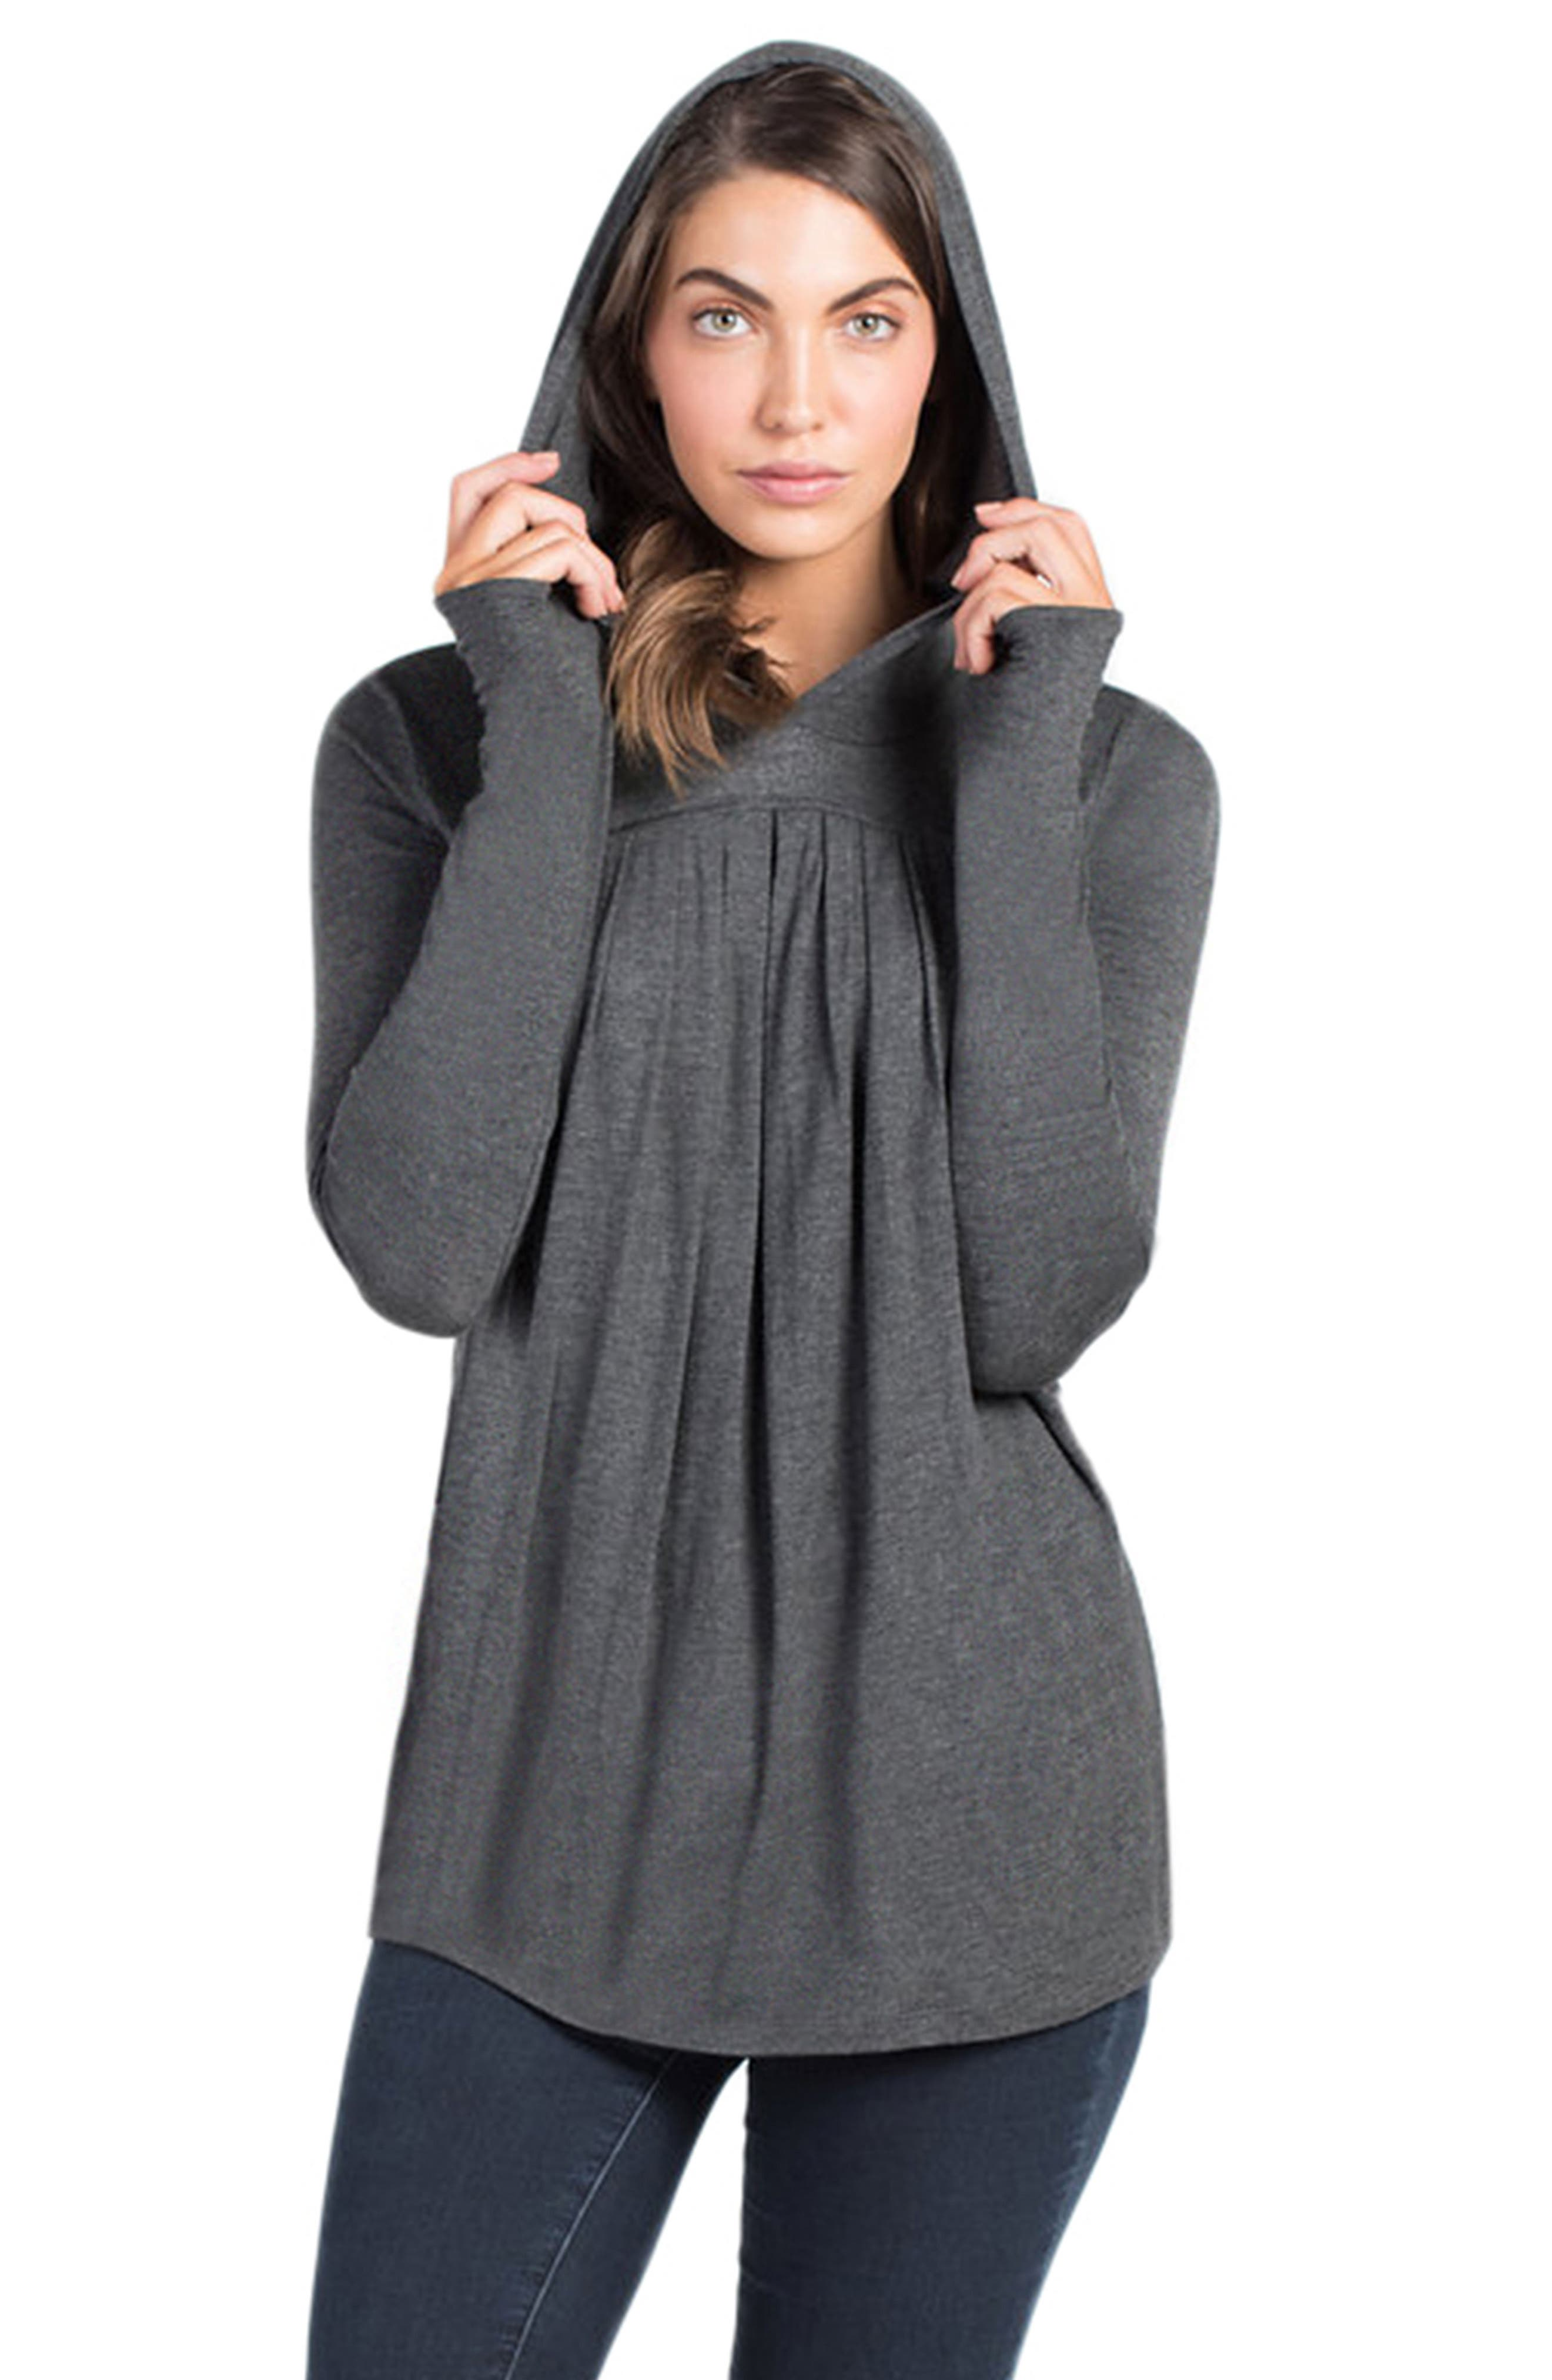 Hooded Maternity/Nursing Tunic,                             Main thumbnail 1, color,                             Charcoal Grey